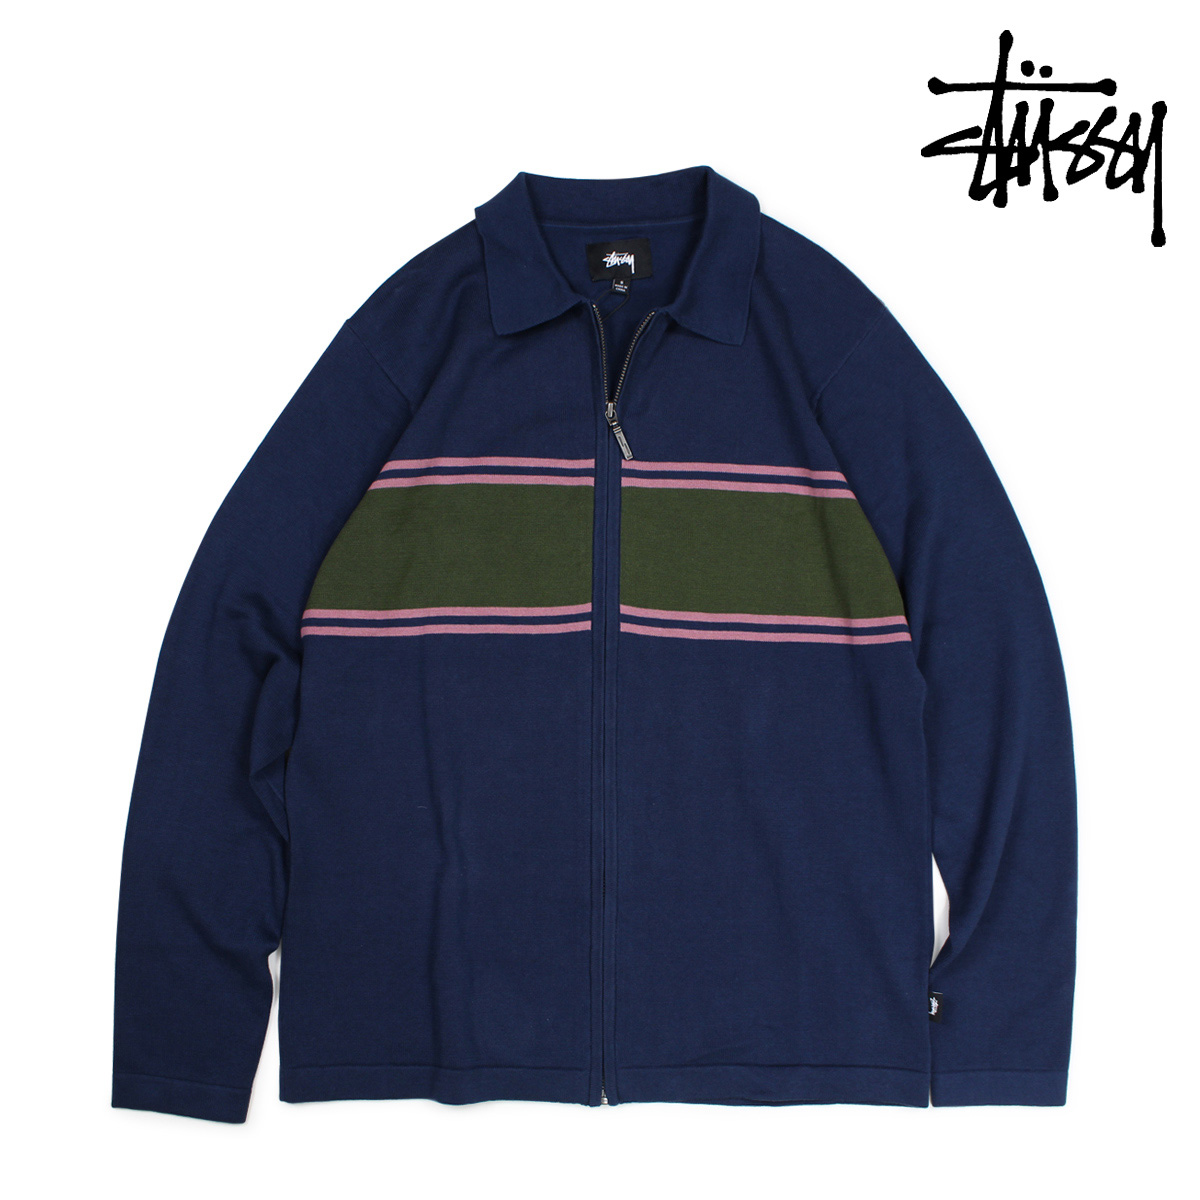 STUSSY CODY STRIPE LS POLO SWEATER ステューシー セーター メンズ ポロセーター ネイビー 117050